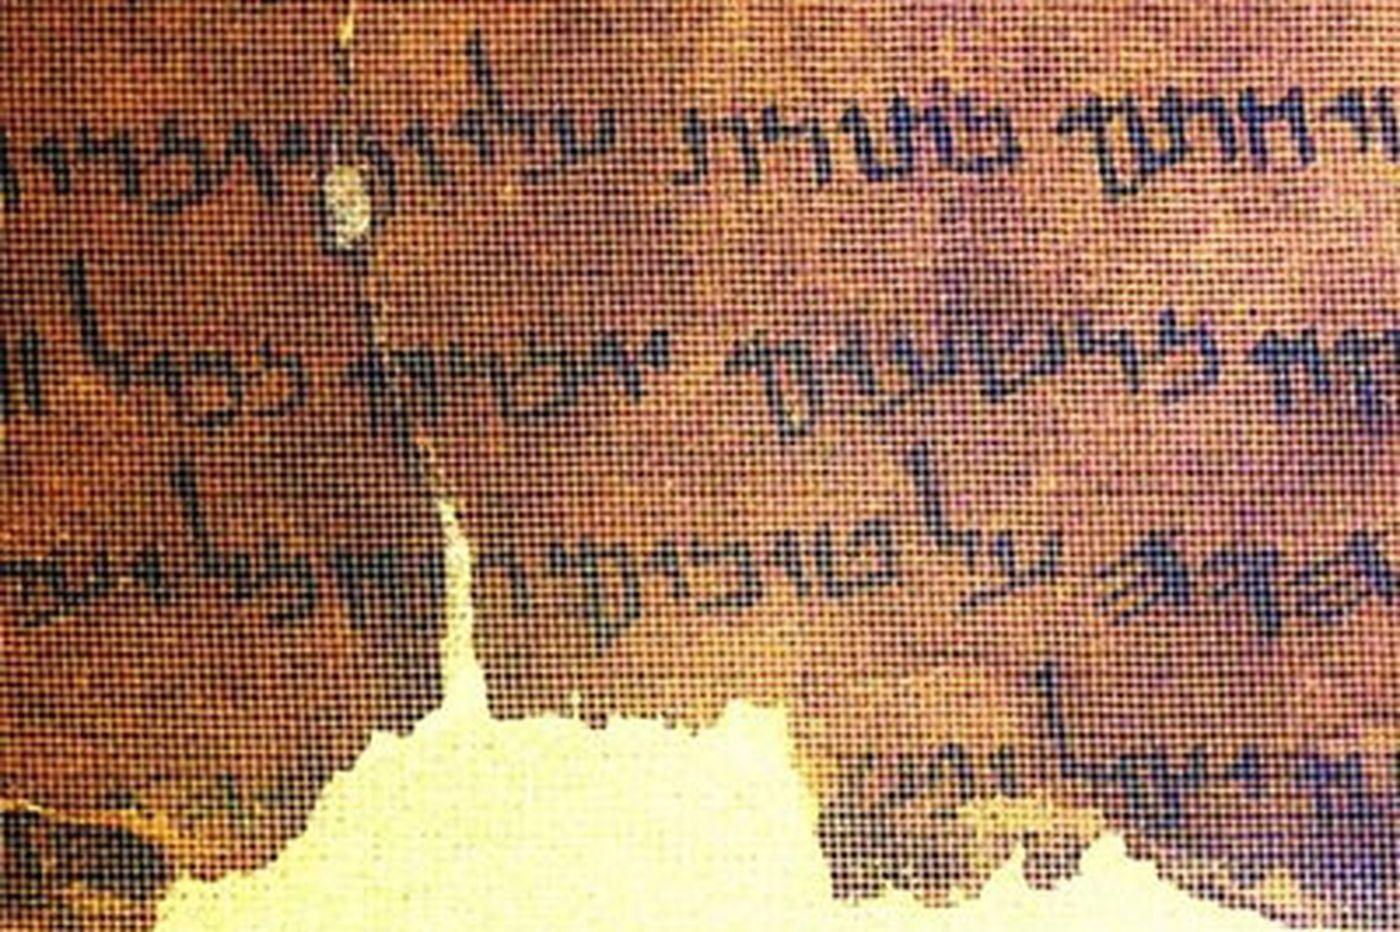 Dead Sea Scrolls: Priceless window into history